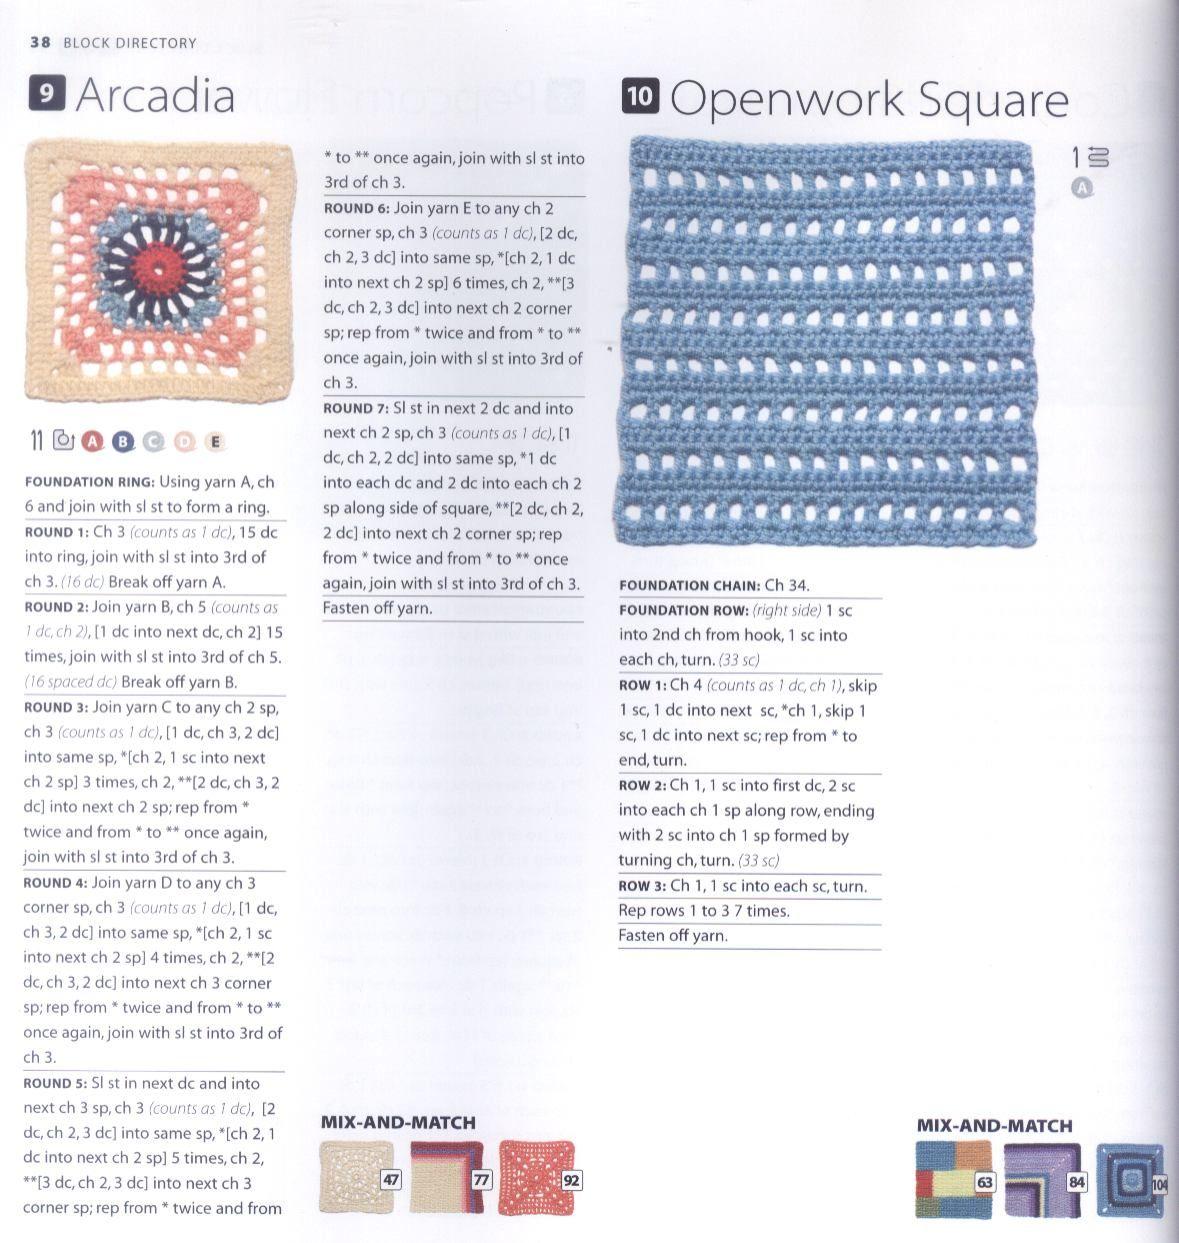 200 Crocheted Blocks for blankets, throws & Afghans 038